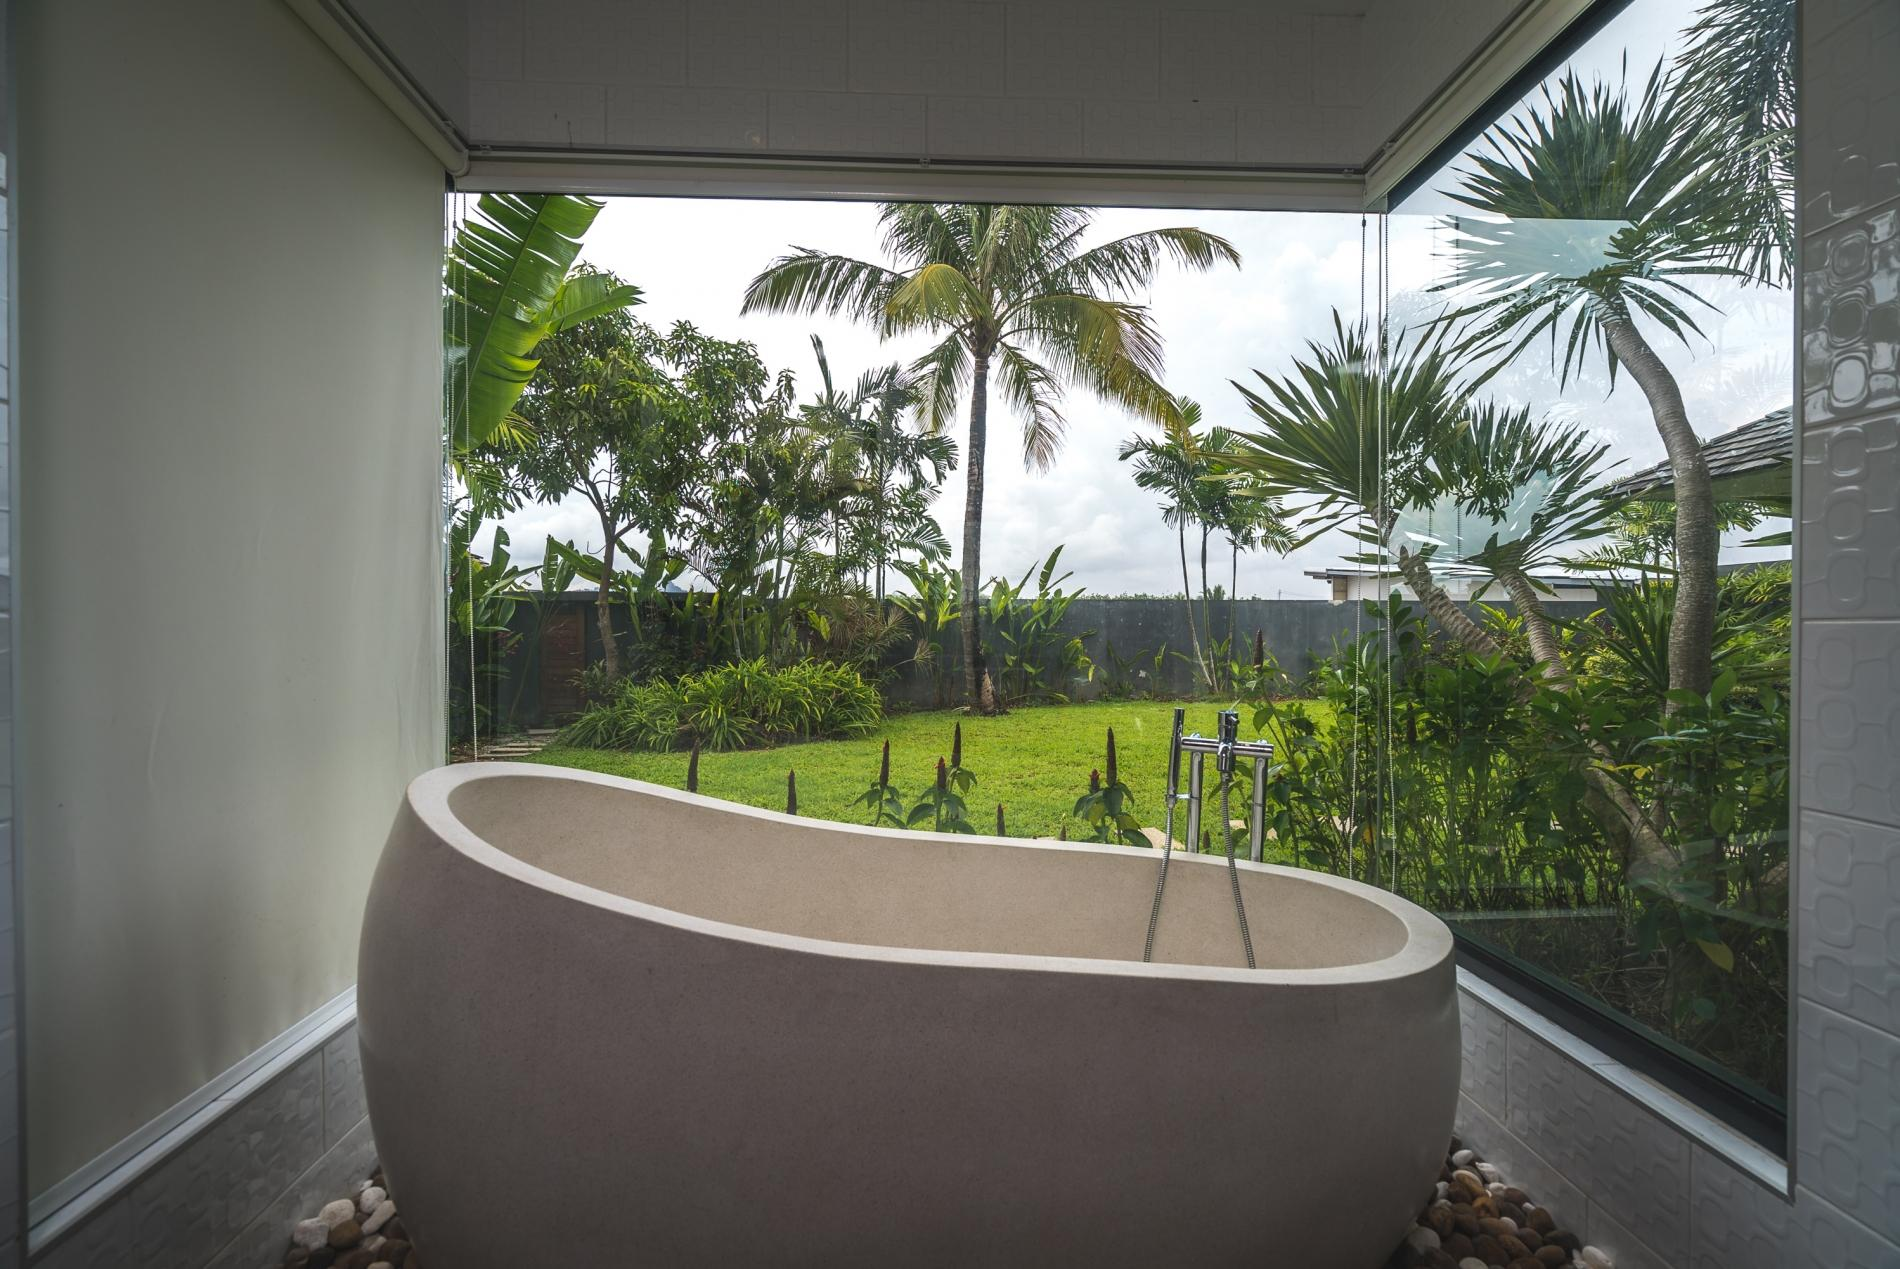 Apartment Diamond 272 - Modern 4 br private pool and garden villa photo 20320664